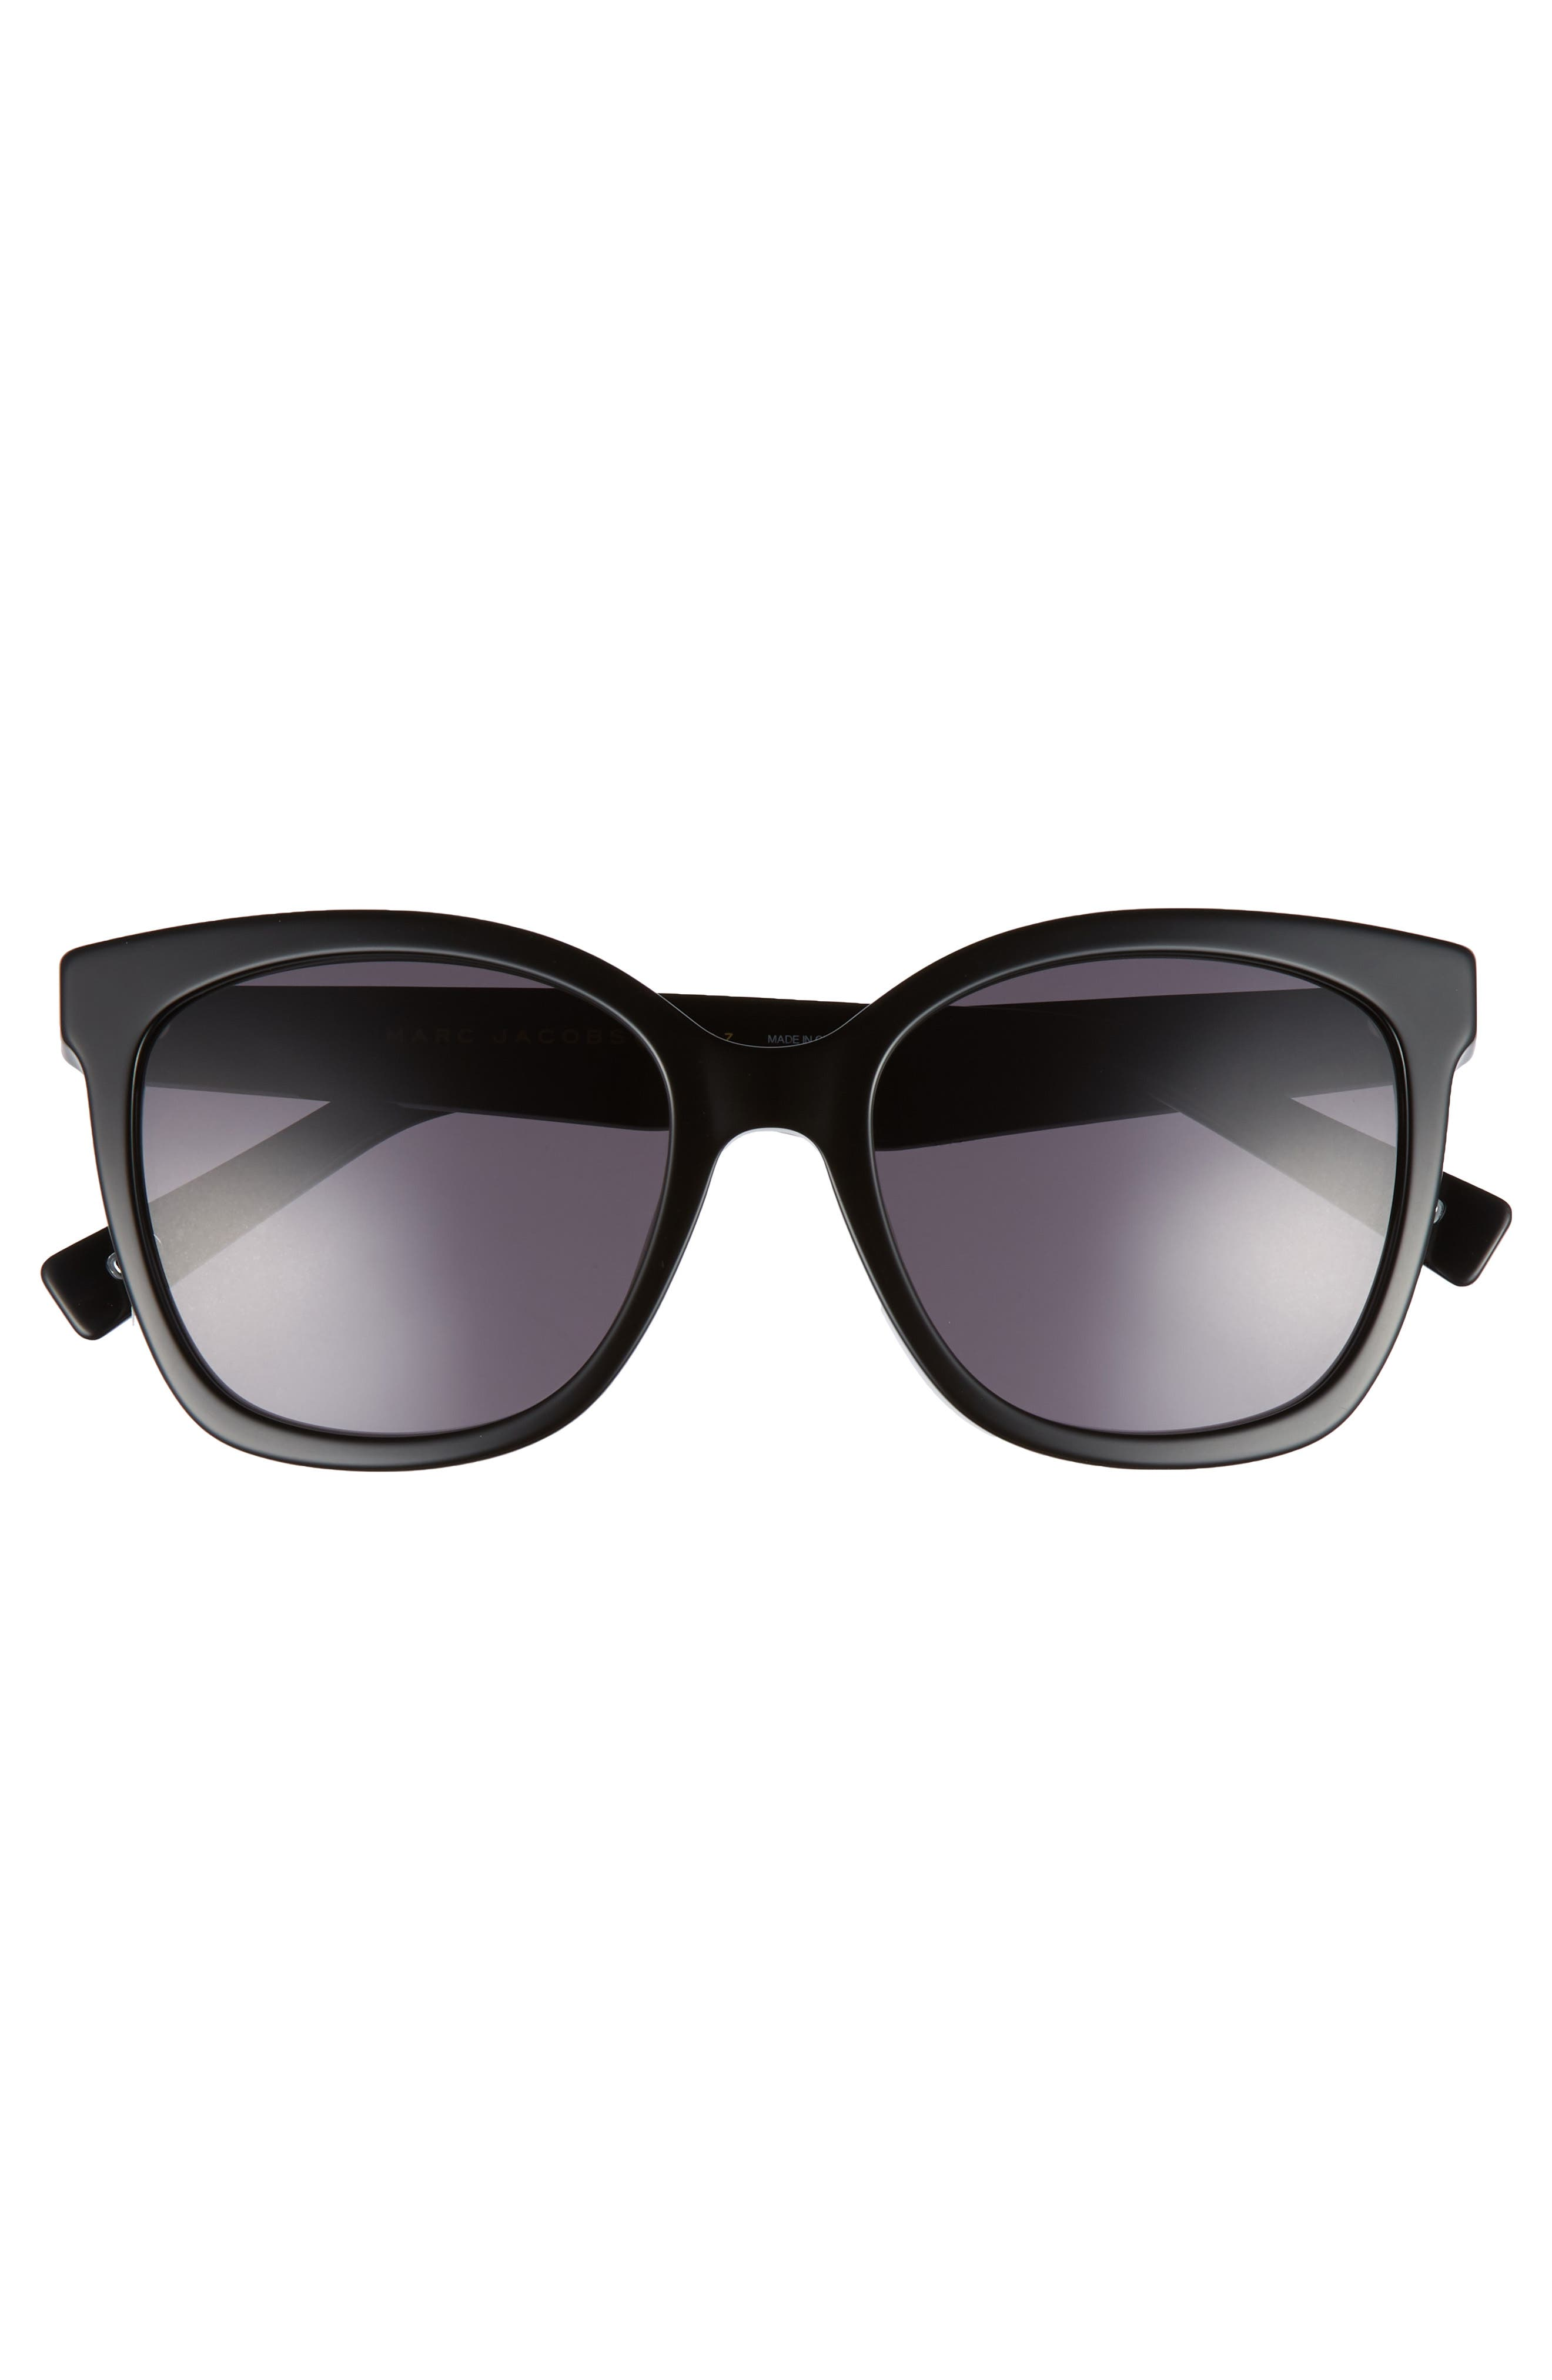 54mm Gradient Lens Sunglasses,                             Alternate thumbnail 3, color,                             Black Polar